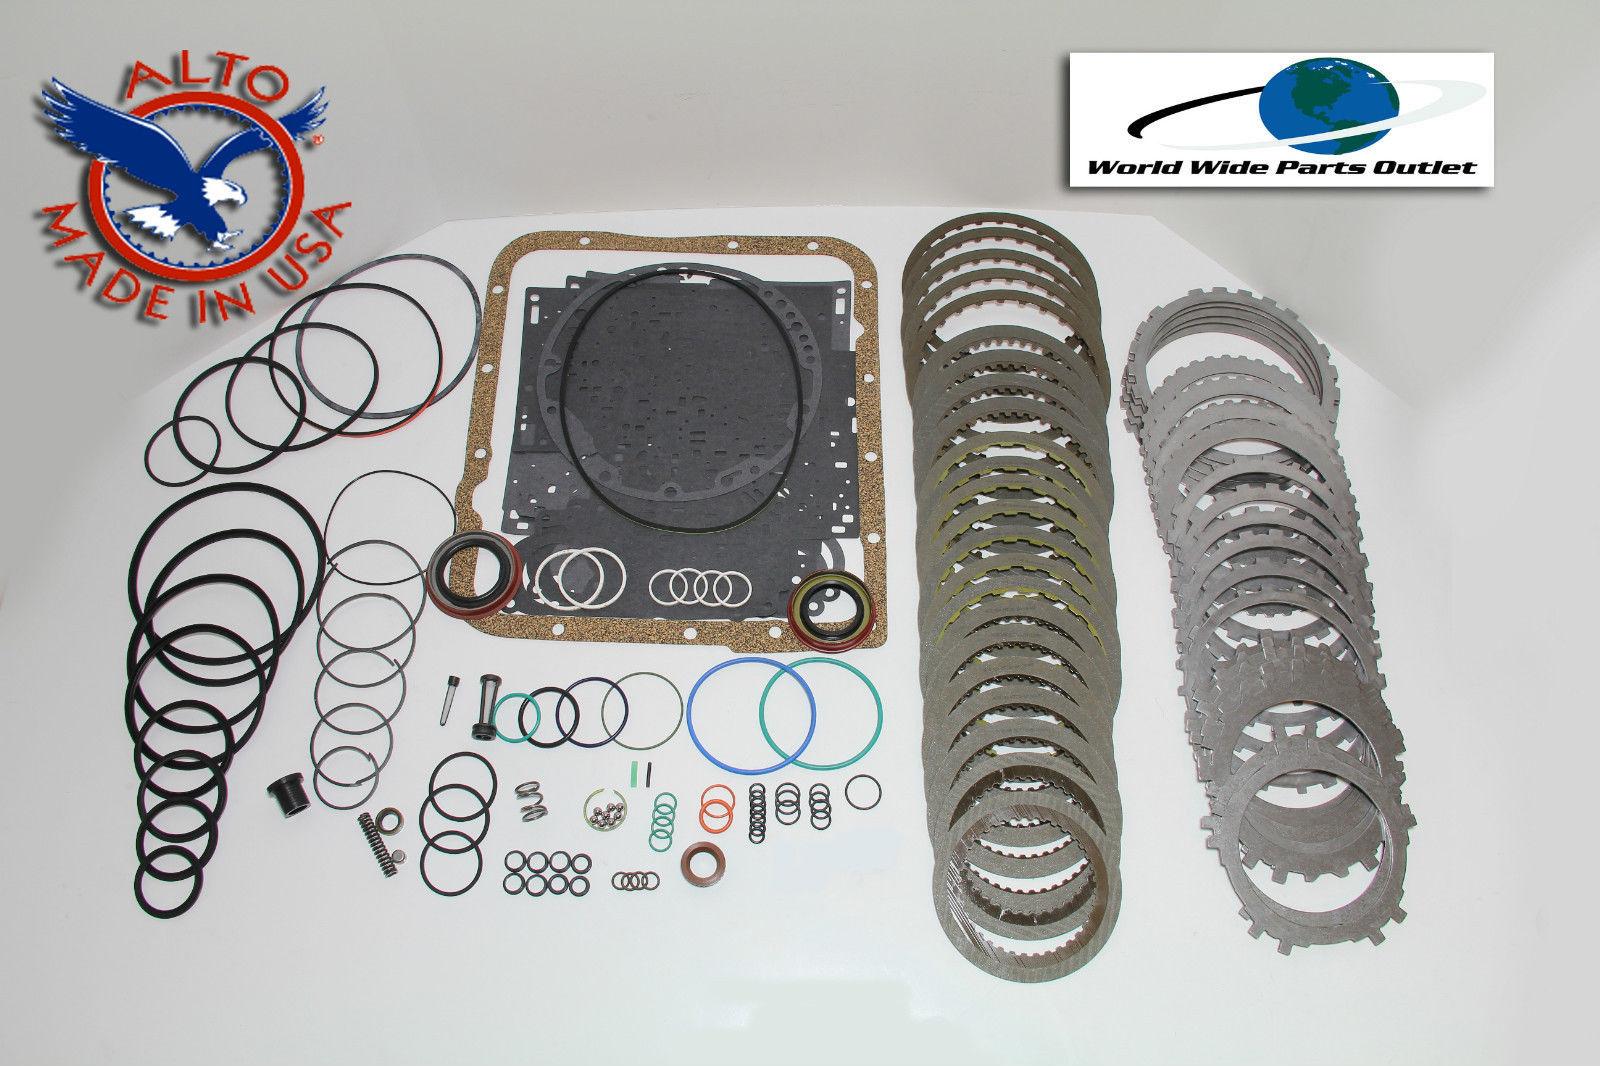 4L60E transmission rebuild kit heavy duty HEG master kit Stage 3 1993 1996